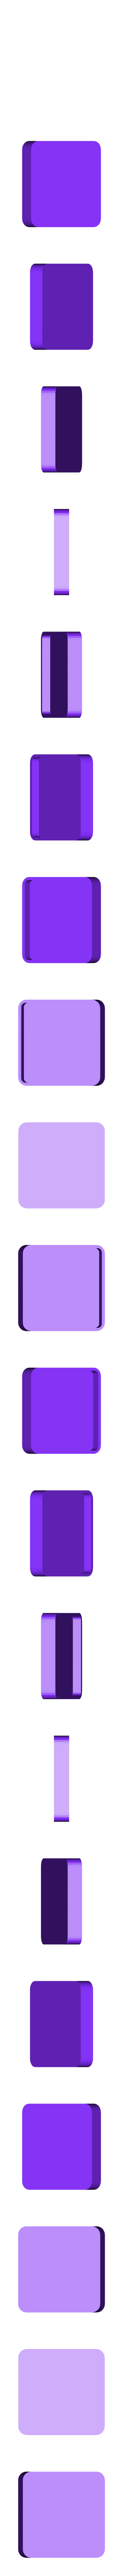 Boite-20x20x15-Dessus.stl Download STL file Storage box for model making 20 x 20 x 20 x 15 mm • Object to 3D print, Almisuifre